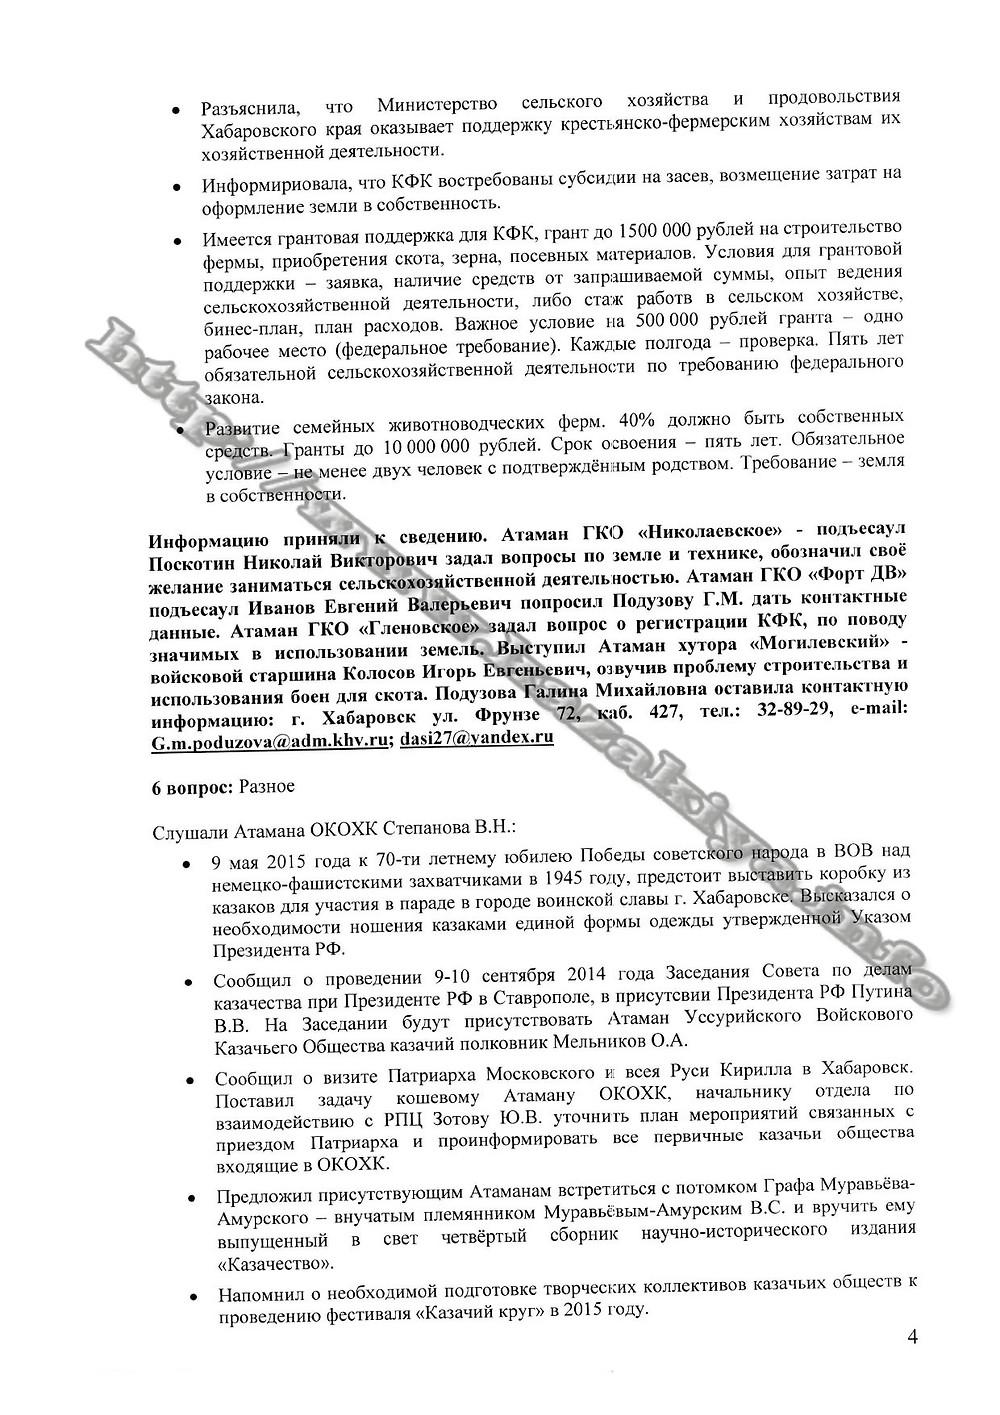 Протокол Совета Атаманов ОКОХК 20.08.14-страница4.jpg.jpg